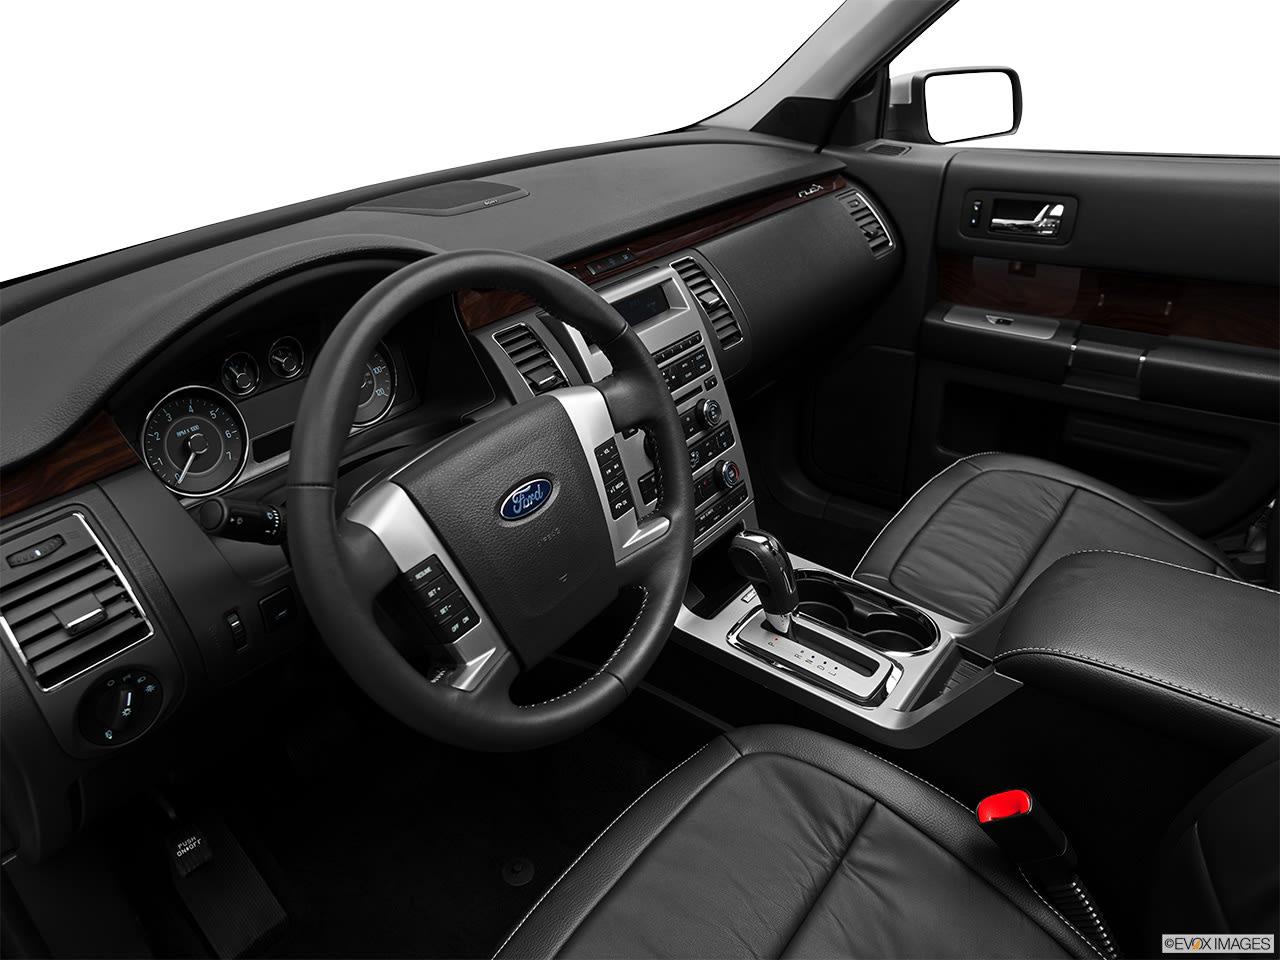 Ford Flex 2012 Interior